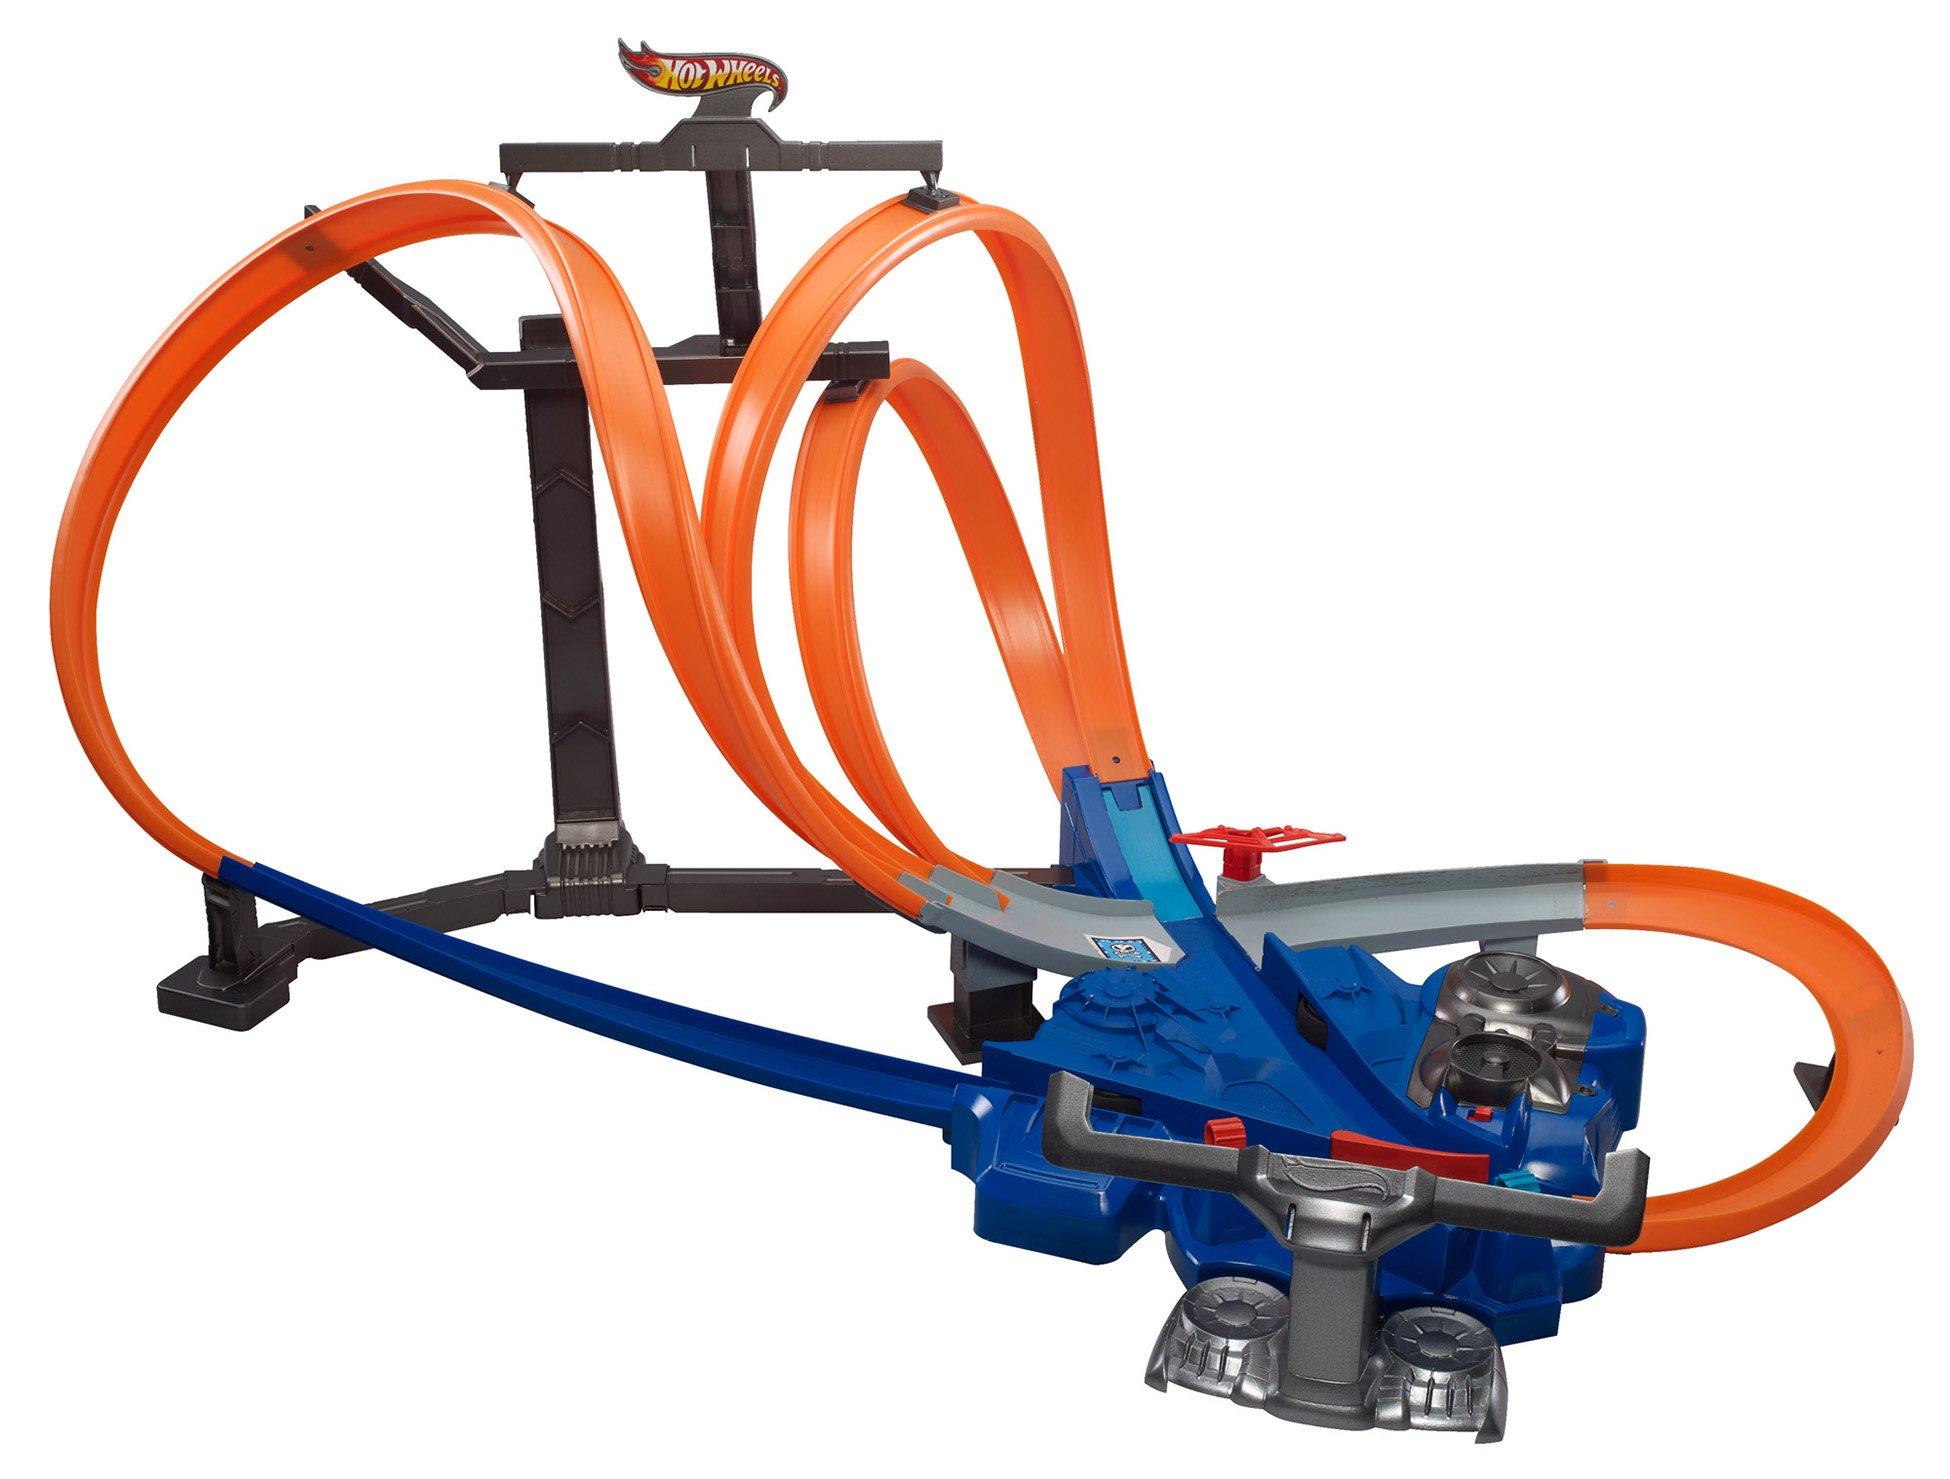 Hot Wheels Triple Track Twister Track Set